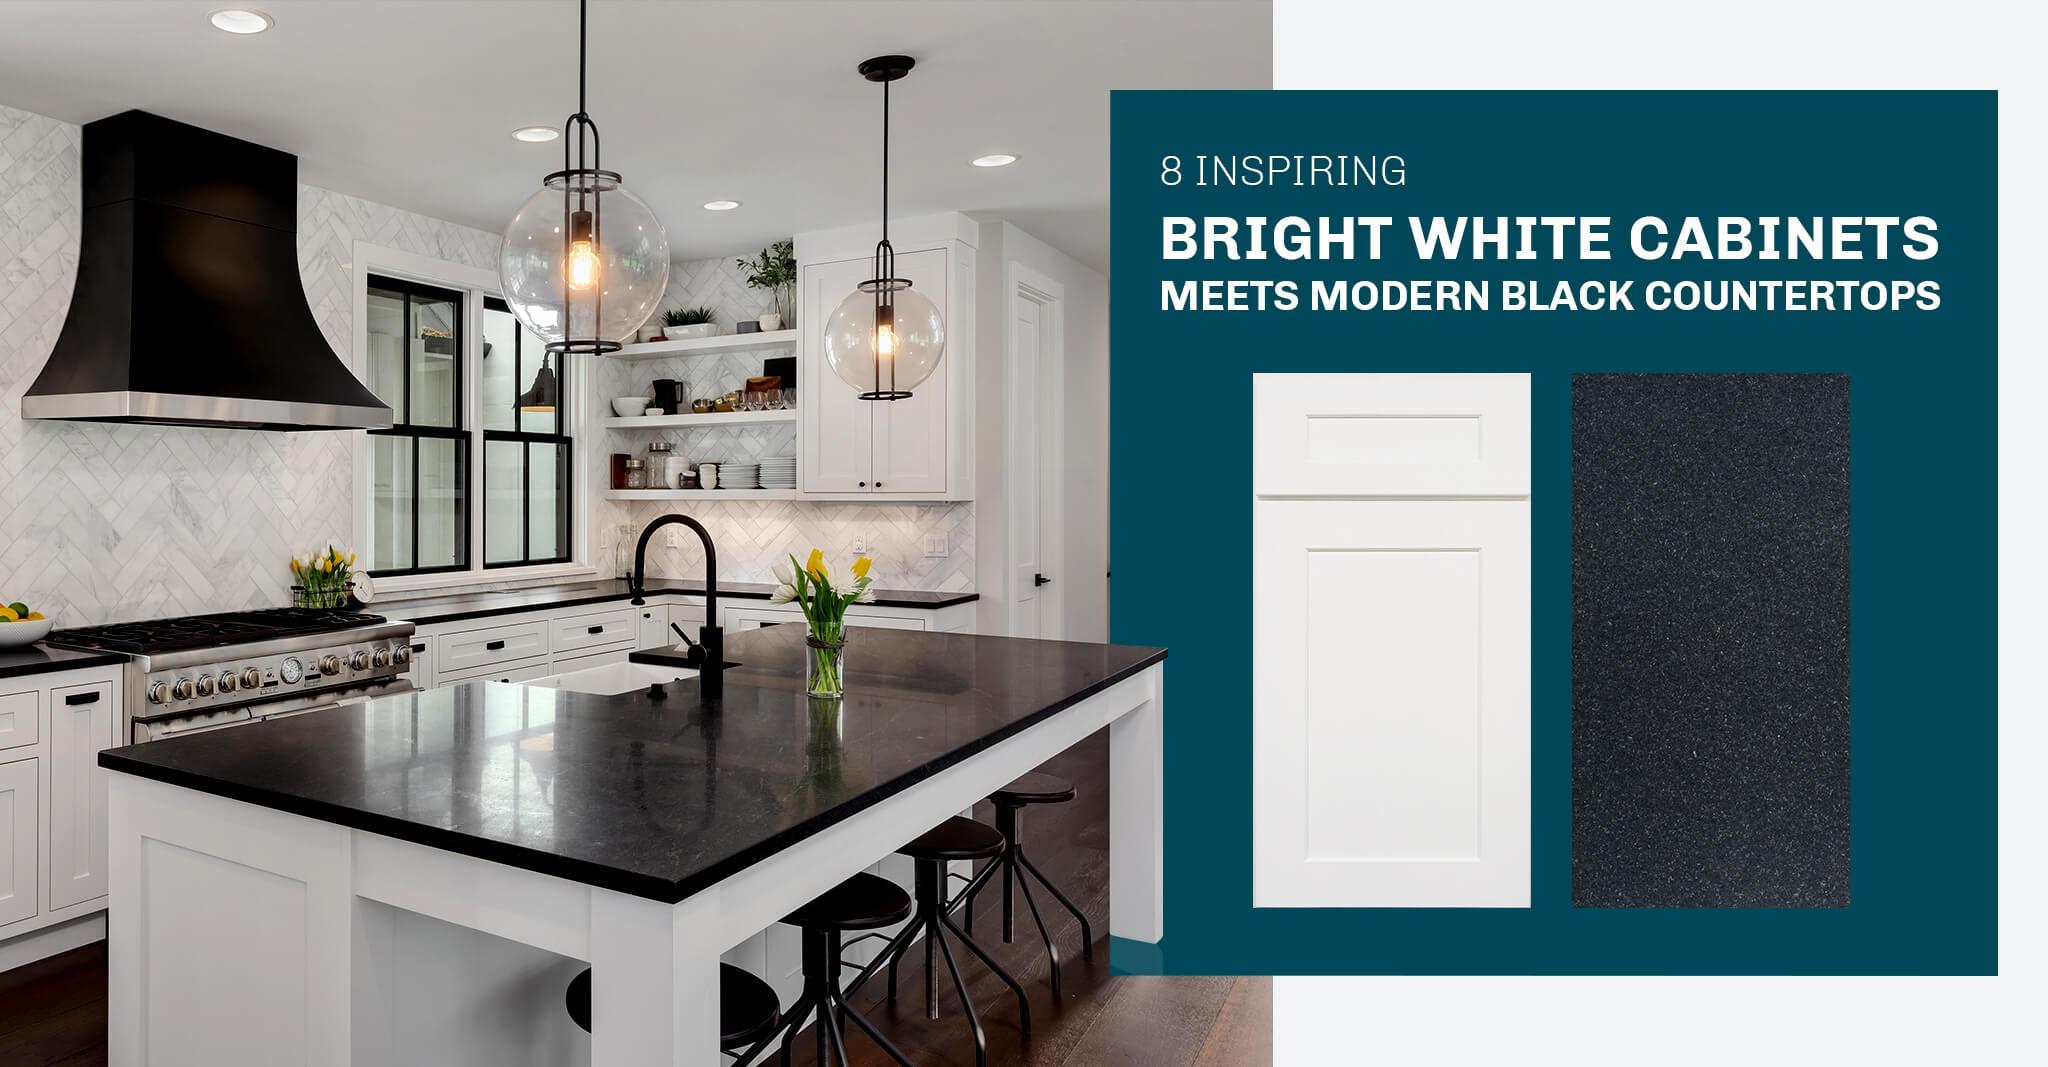 8 Inspiring Kitchen Designs: Modern Black Countertops Meet Bright White Cabinets